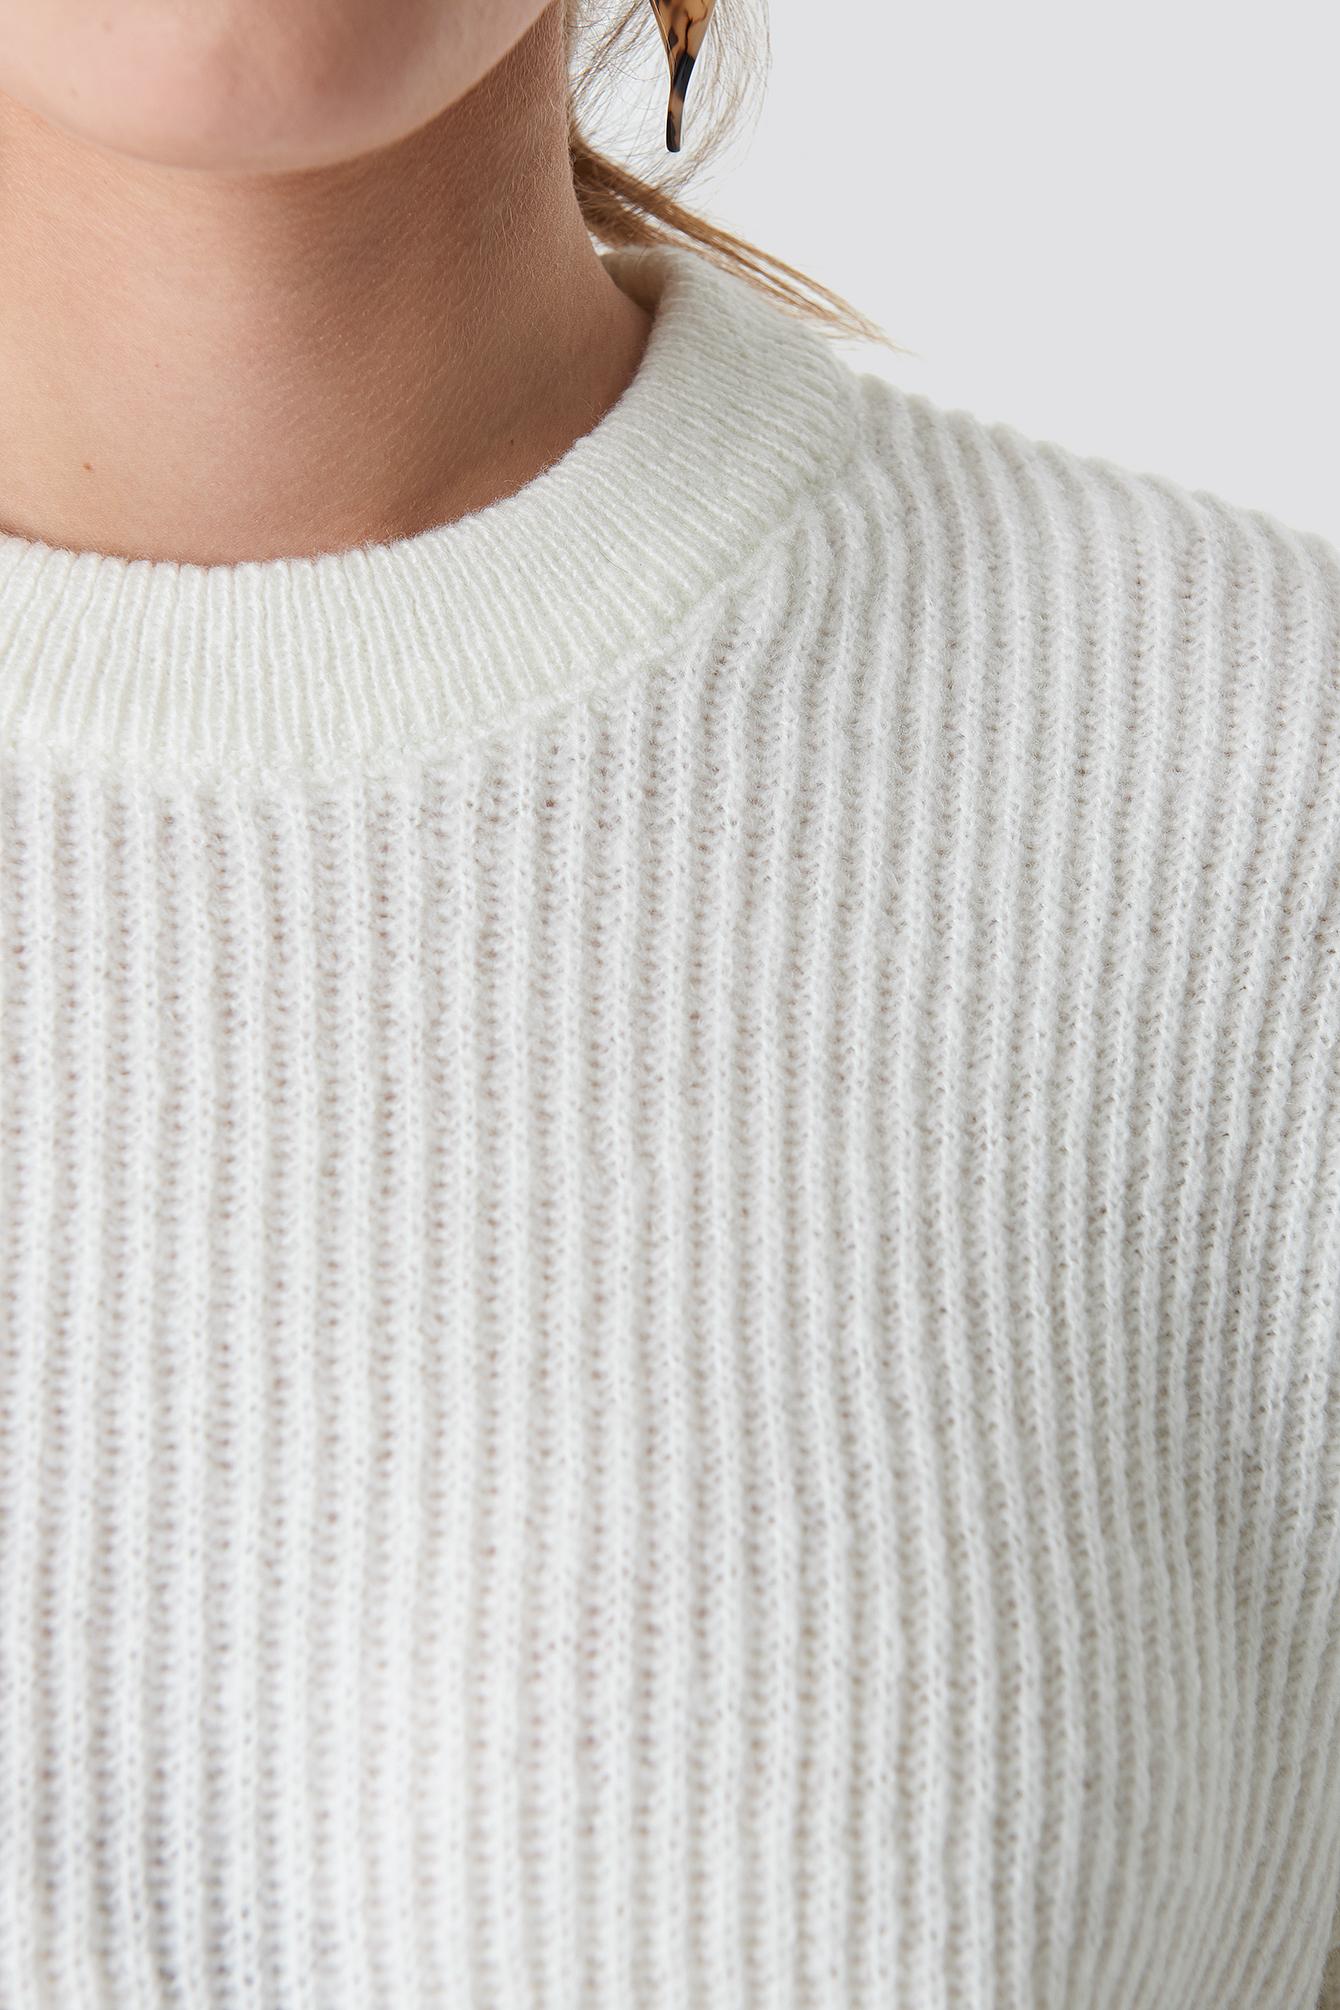 Katarina Juric Knitted Sweater NA-KD.COM